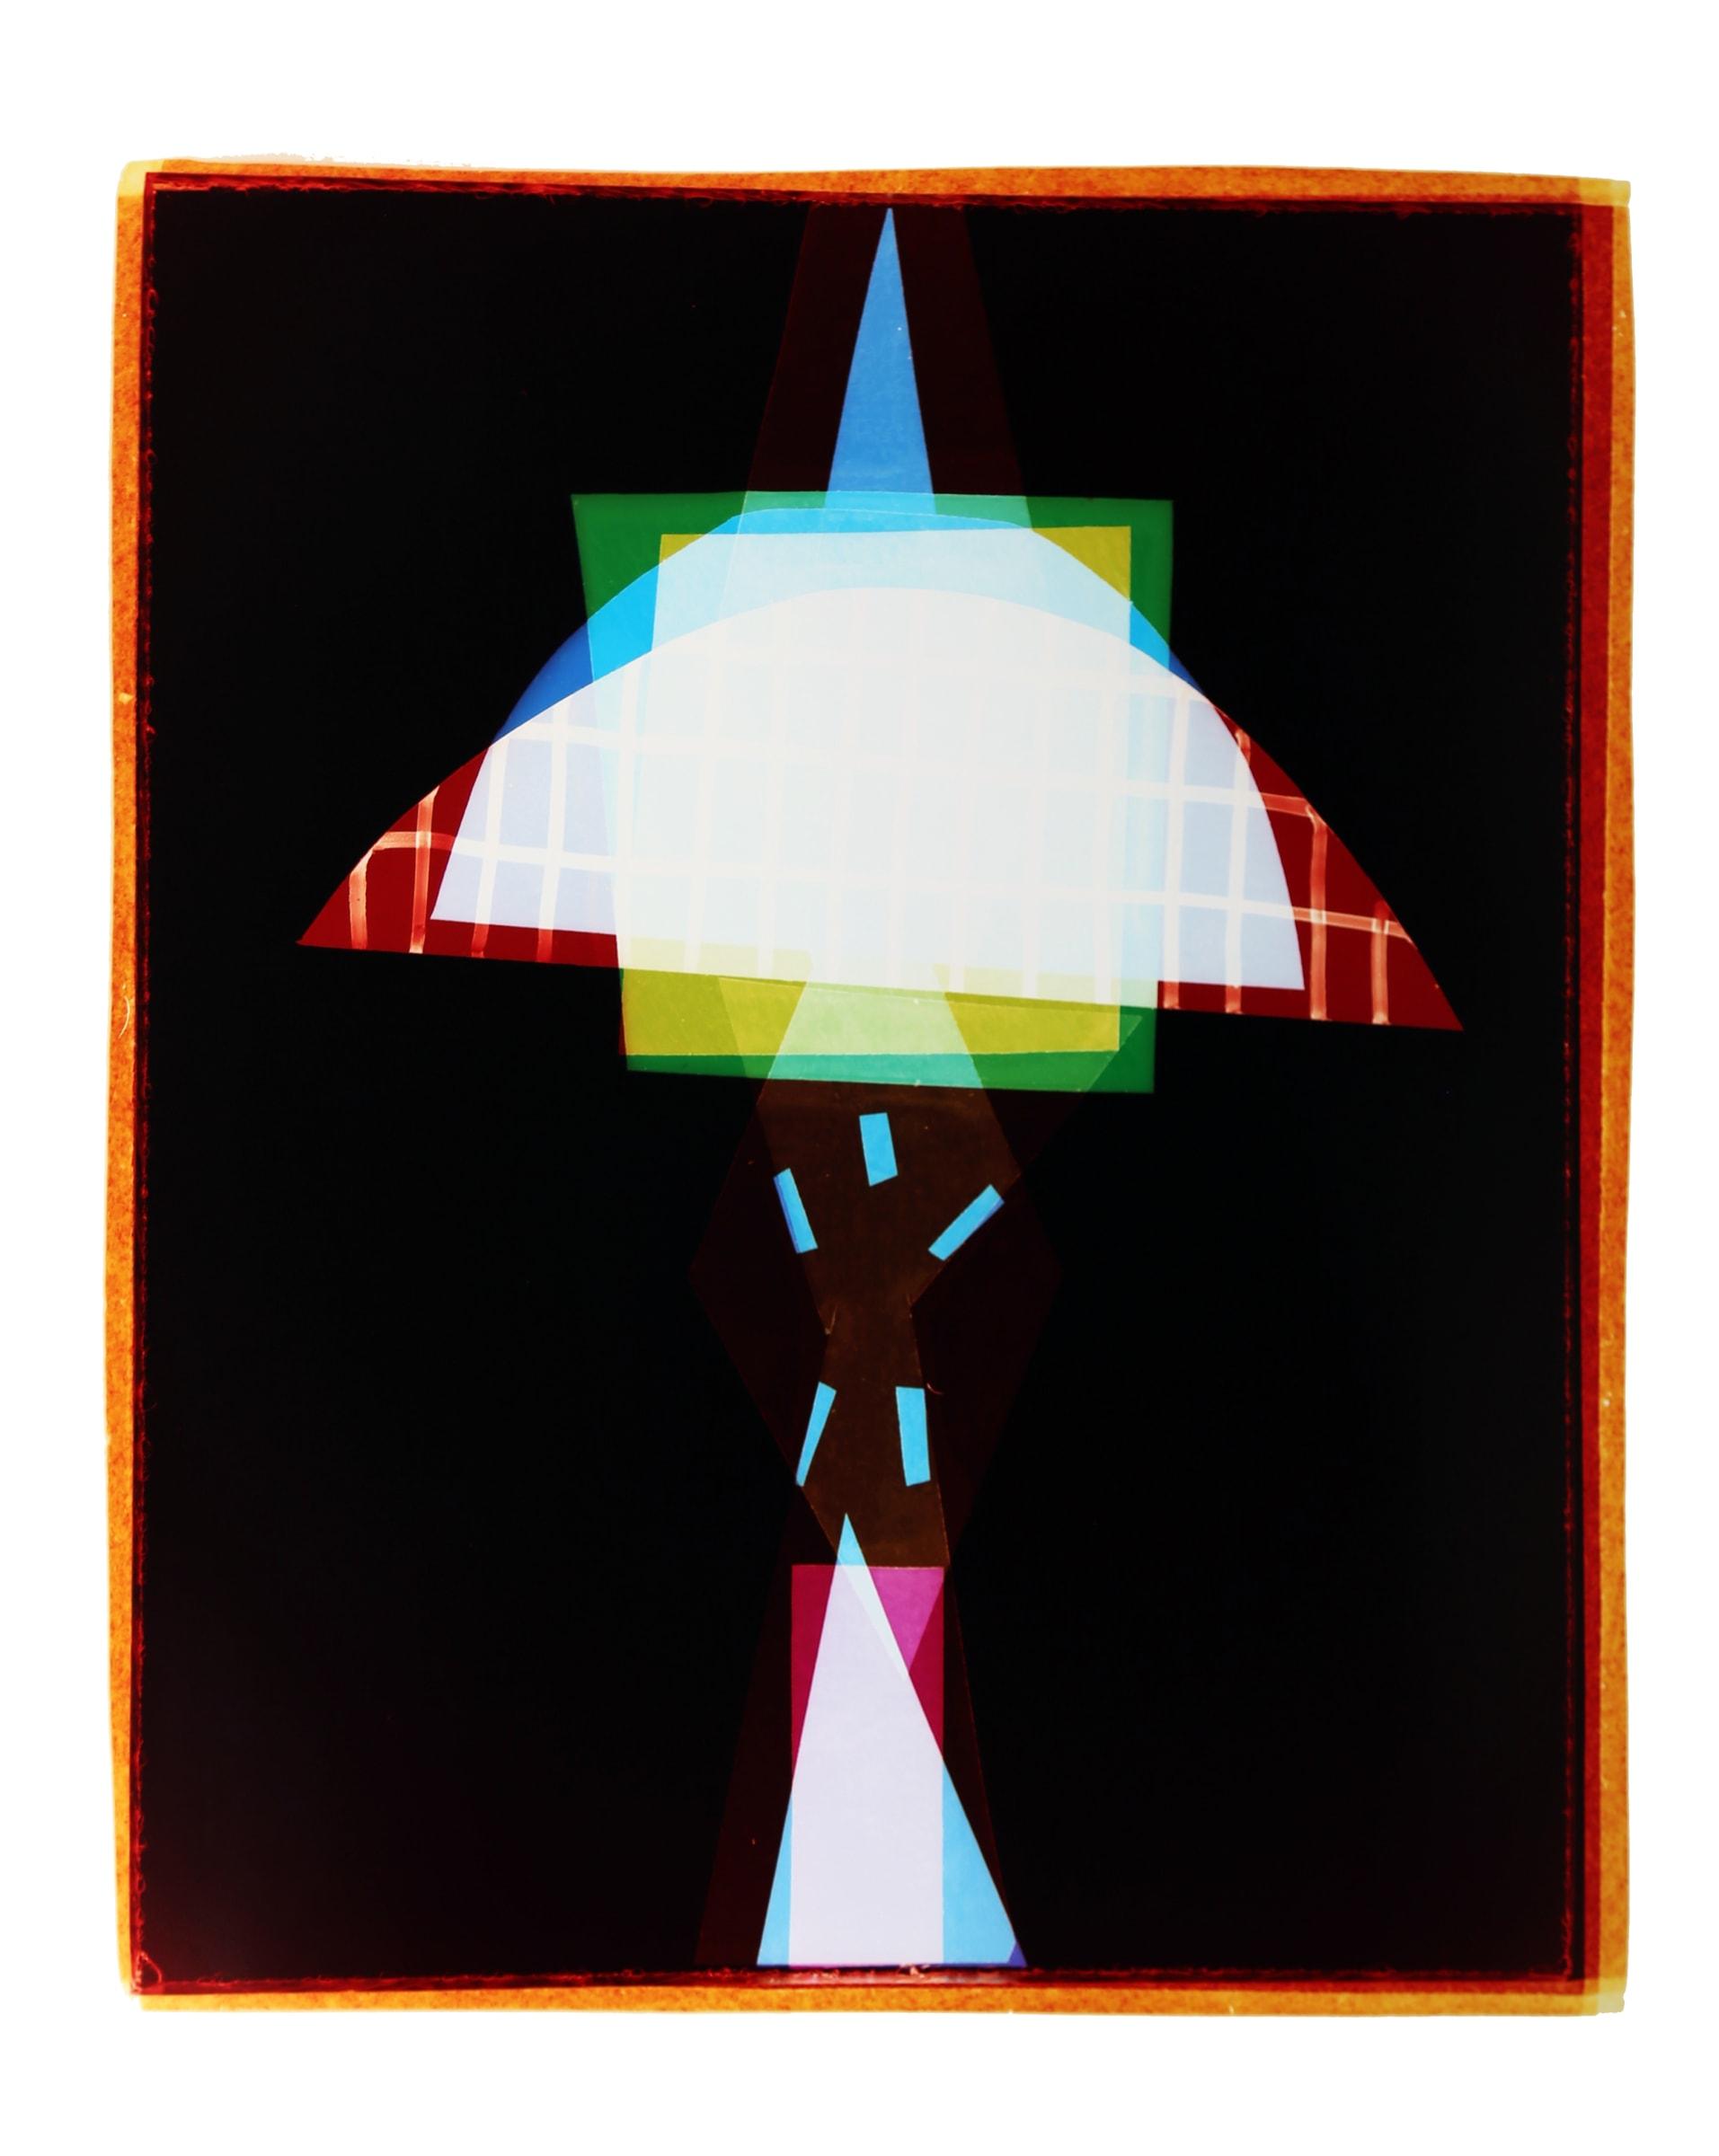 "<span class=""link fancybox-details-link""><a href=""/exhibitions/10/works/artworks36/"">View Detail Page</a></span><div class=""artist""><strong>Liz Nielsen</strong></div><div class=""title""><em>Space Needle Totem</em>, 2015</div><div class=""signed_and_dated"">Signed, titled and dated on artist's label</div><div class=""medium"">Analogue Chromogenic Photogram on Fuji Lustre, Unique</div><div class=""dimensions"">127 x 101.6 cm<br>50 x 40 in</div>"